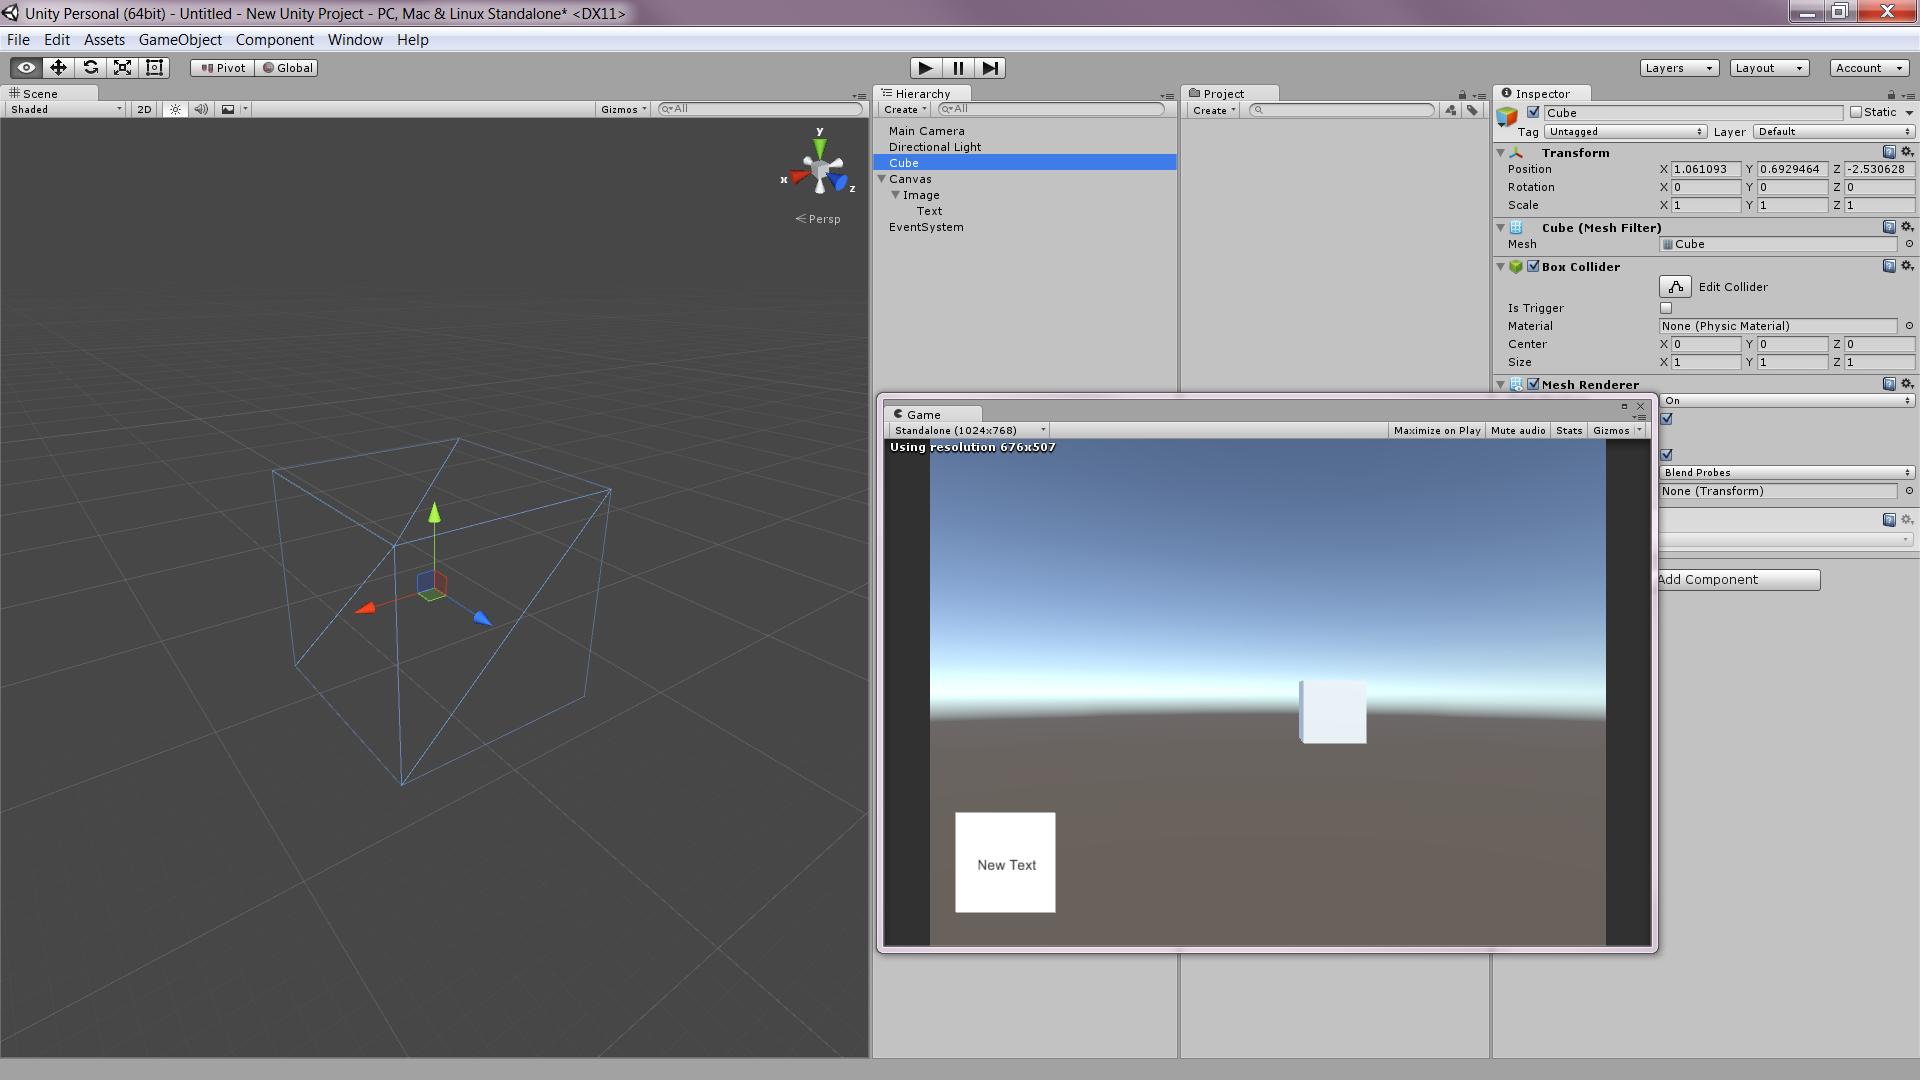 Unity 5 1: Missing geometry in scene view? - Unity Forum